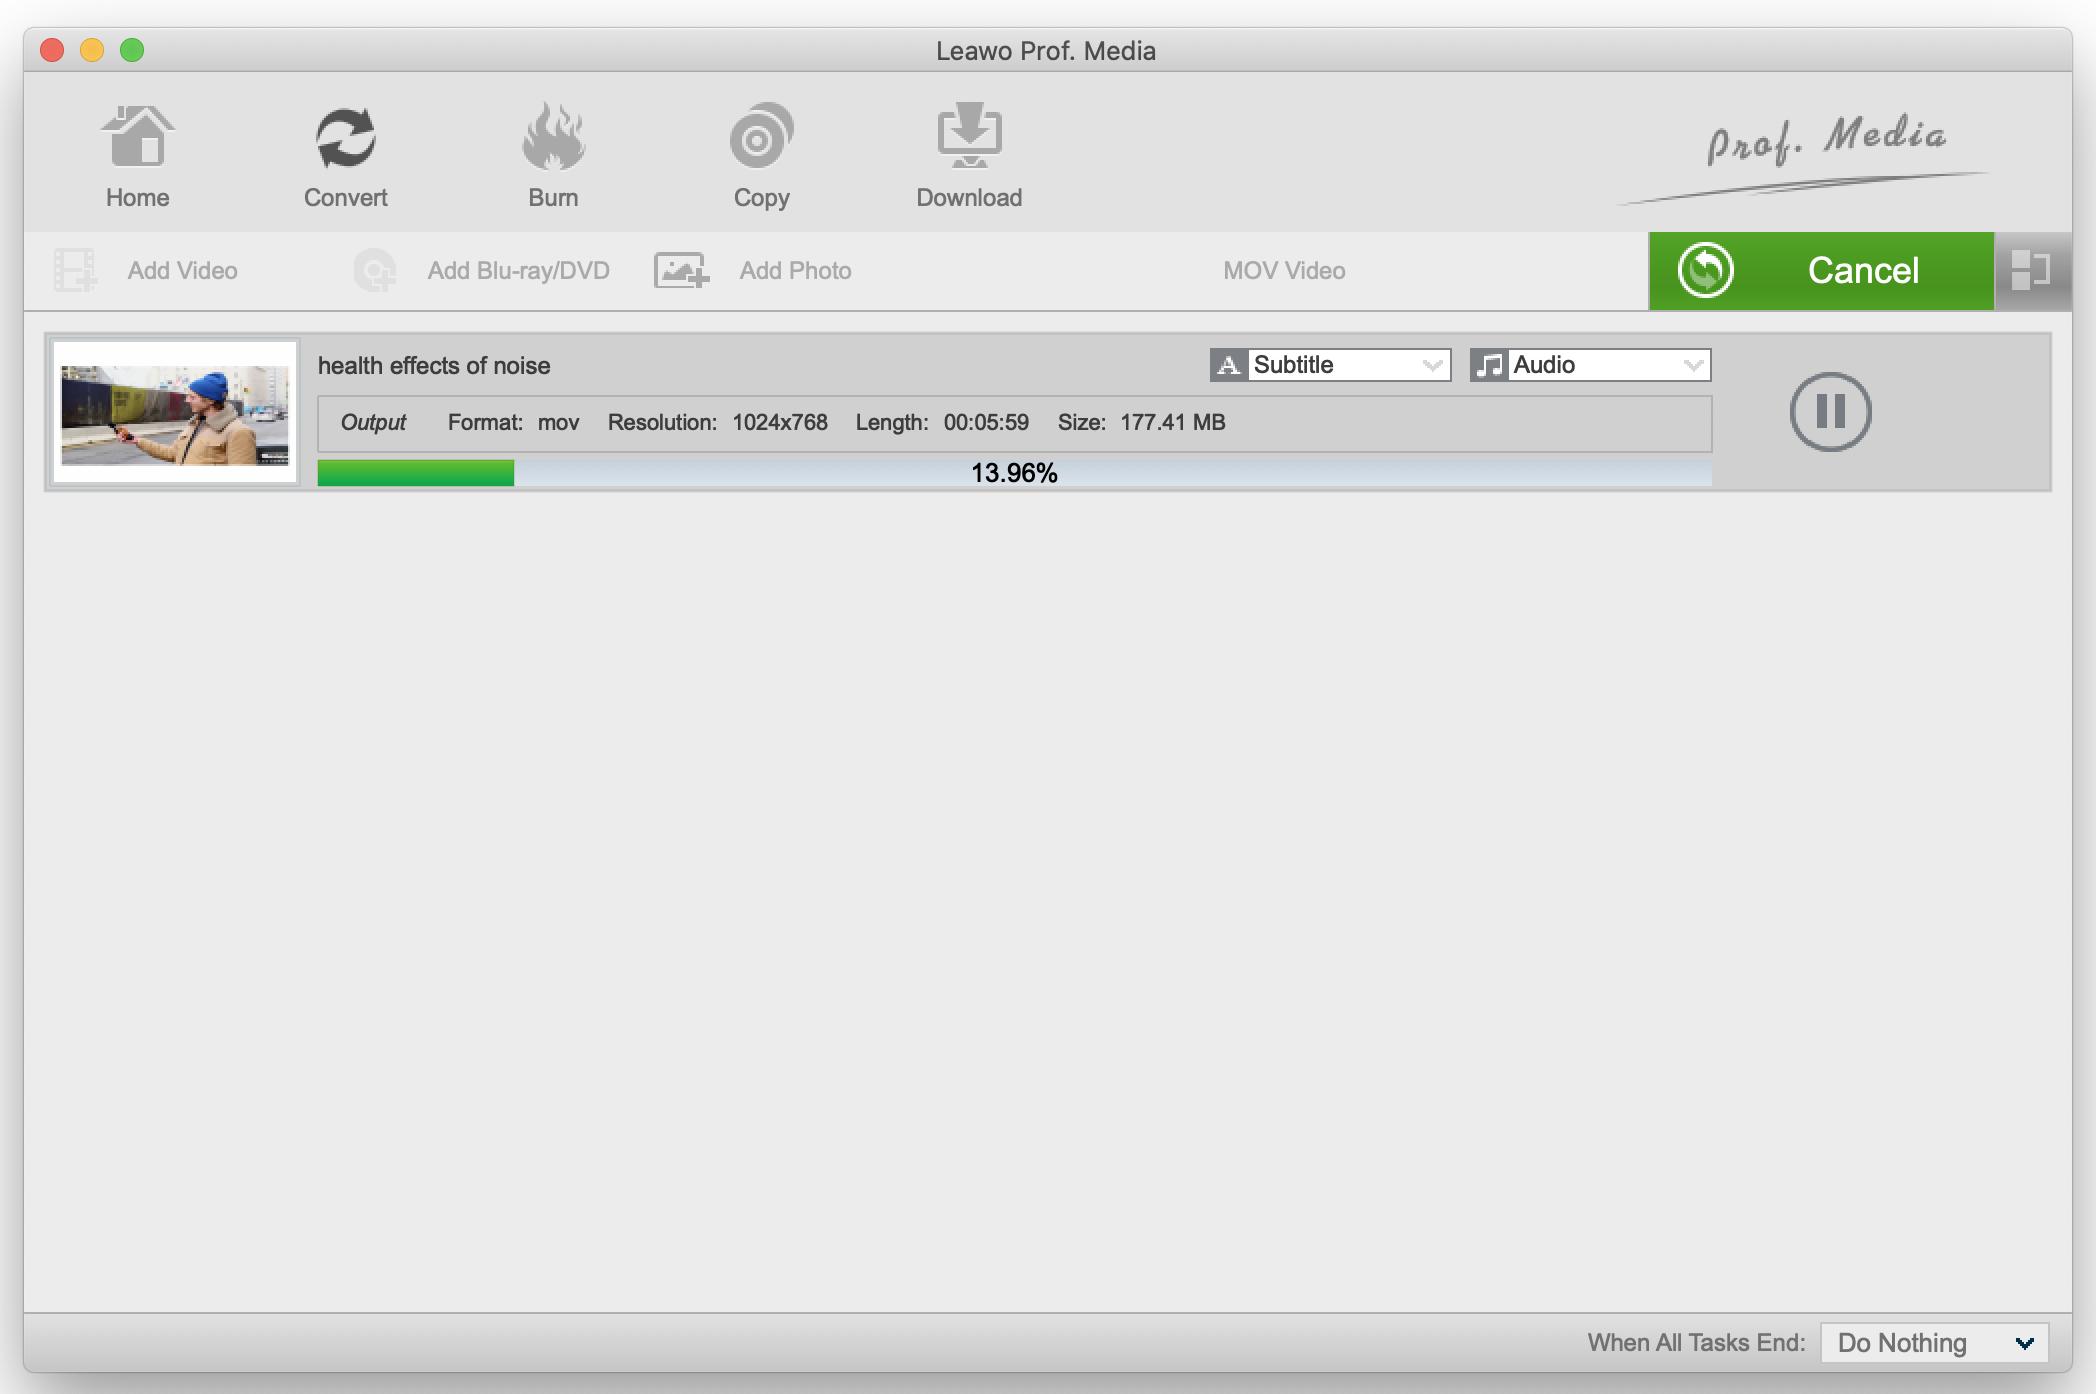 leawo-video-converter-converting-process-08